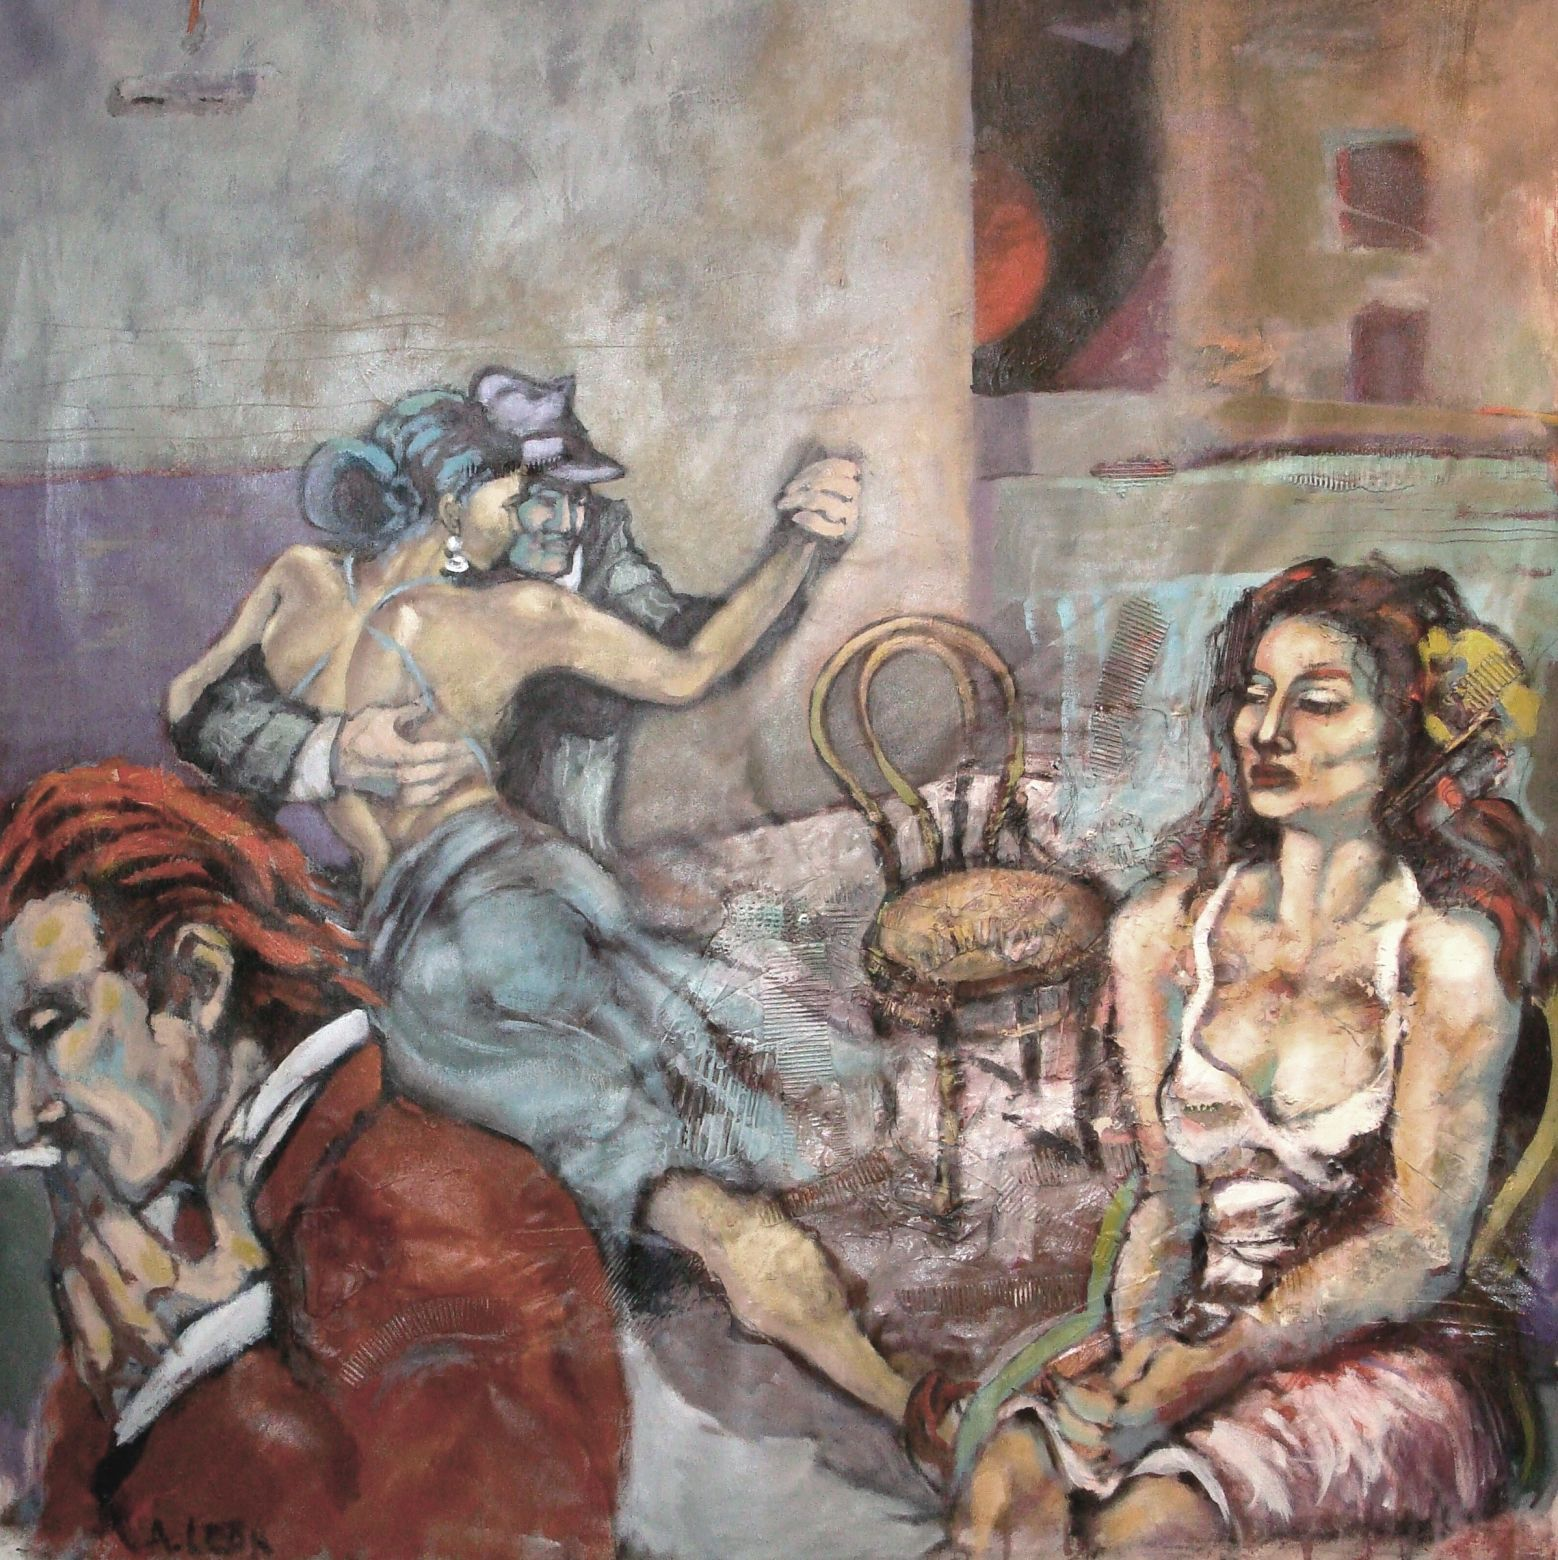 La espera... (2013) - Ana Leon